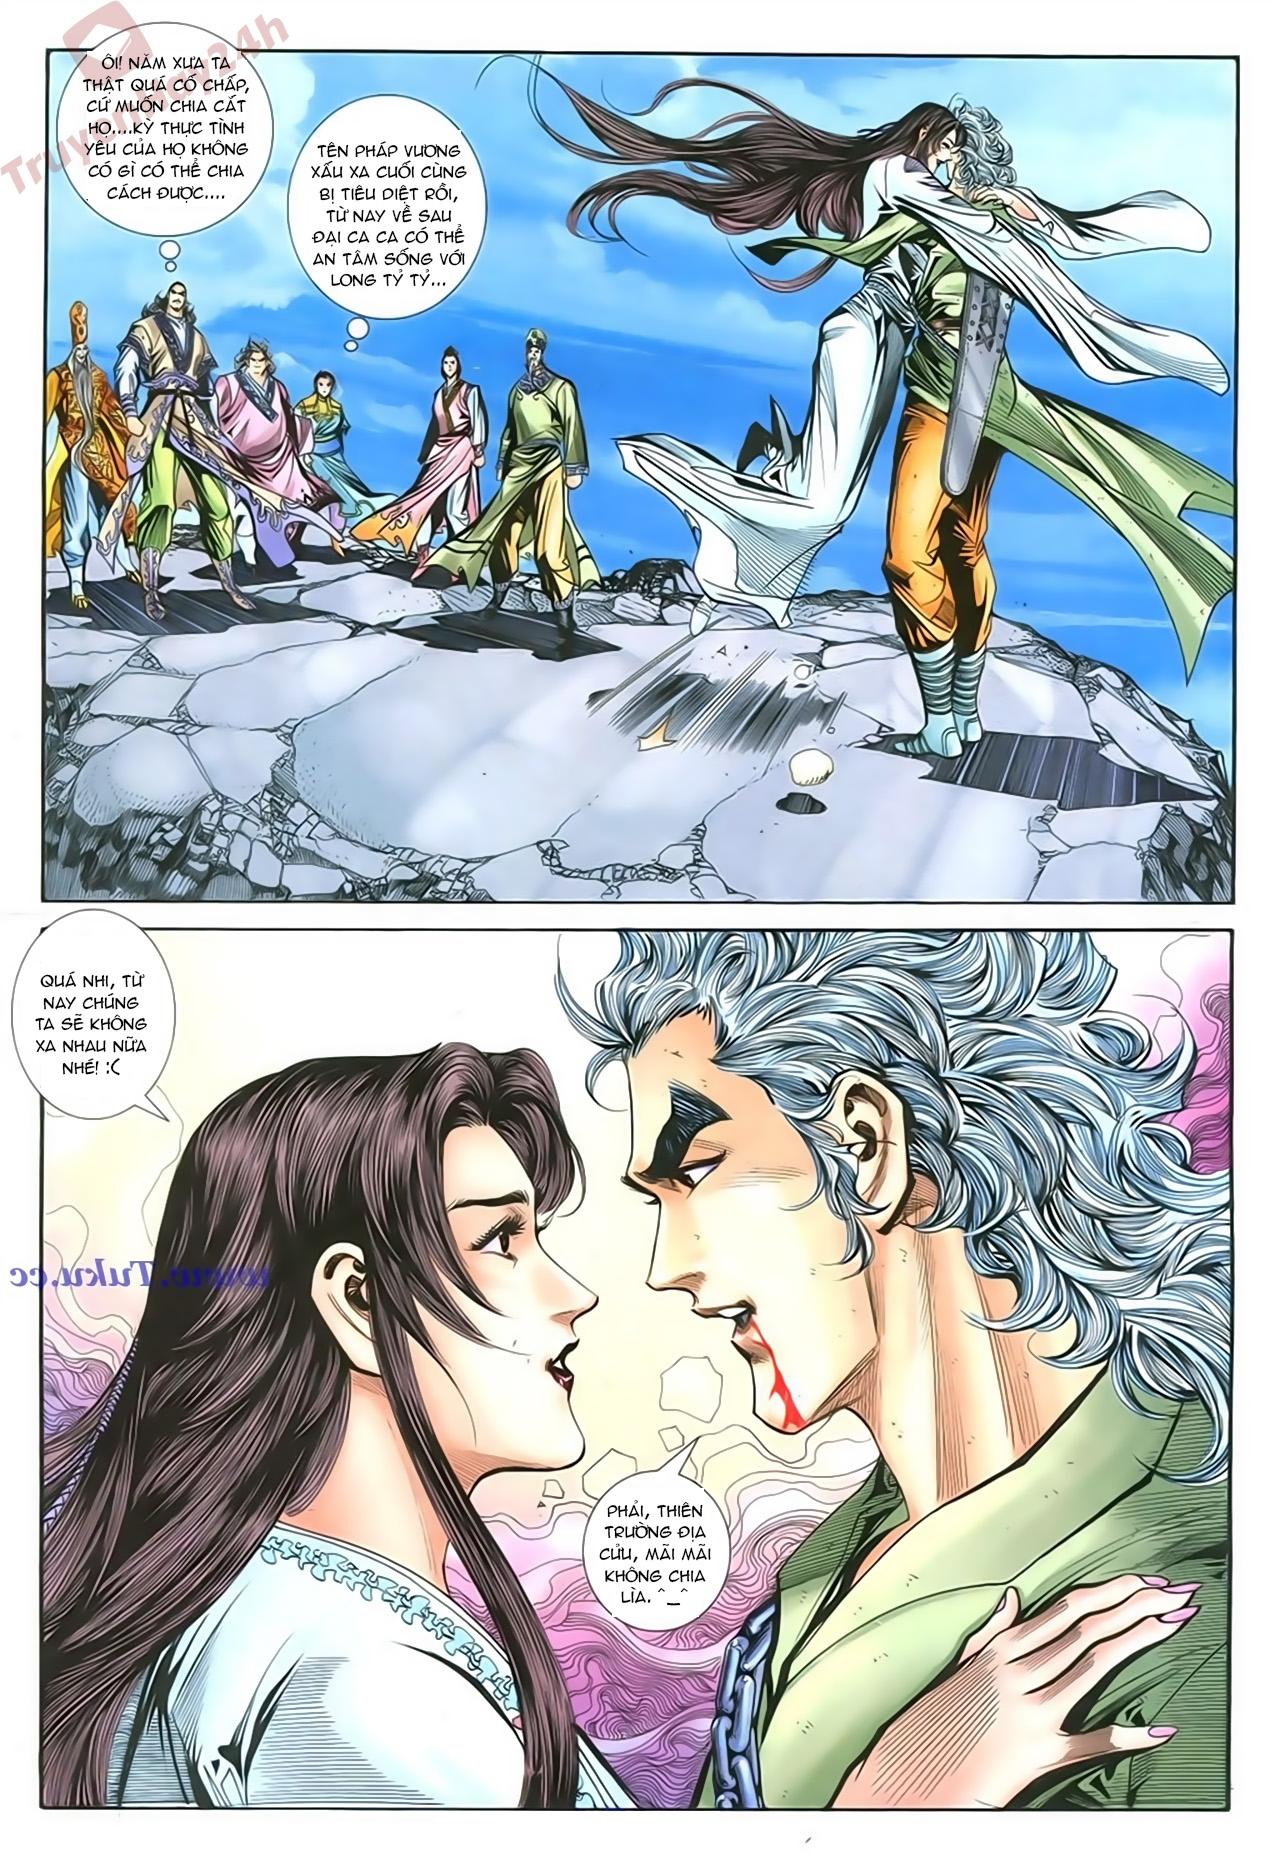 Thần Điêu Hiệp Lữ chap 86 – End Trang 33 - Mangak.info